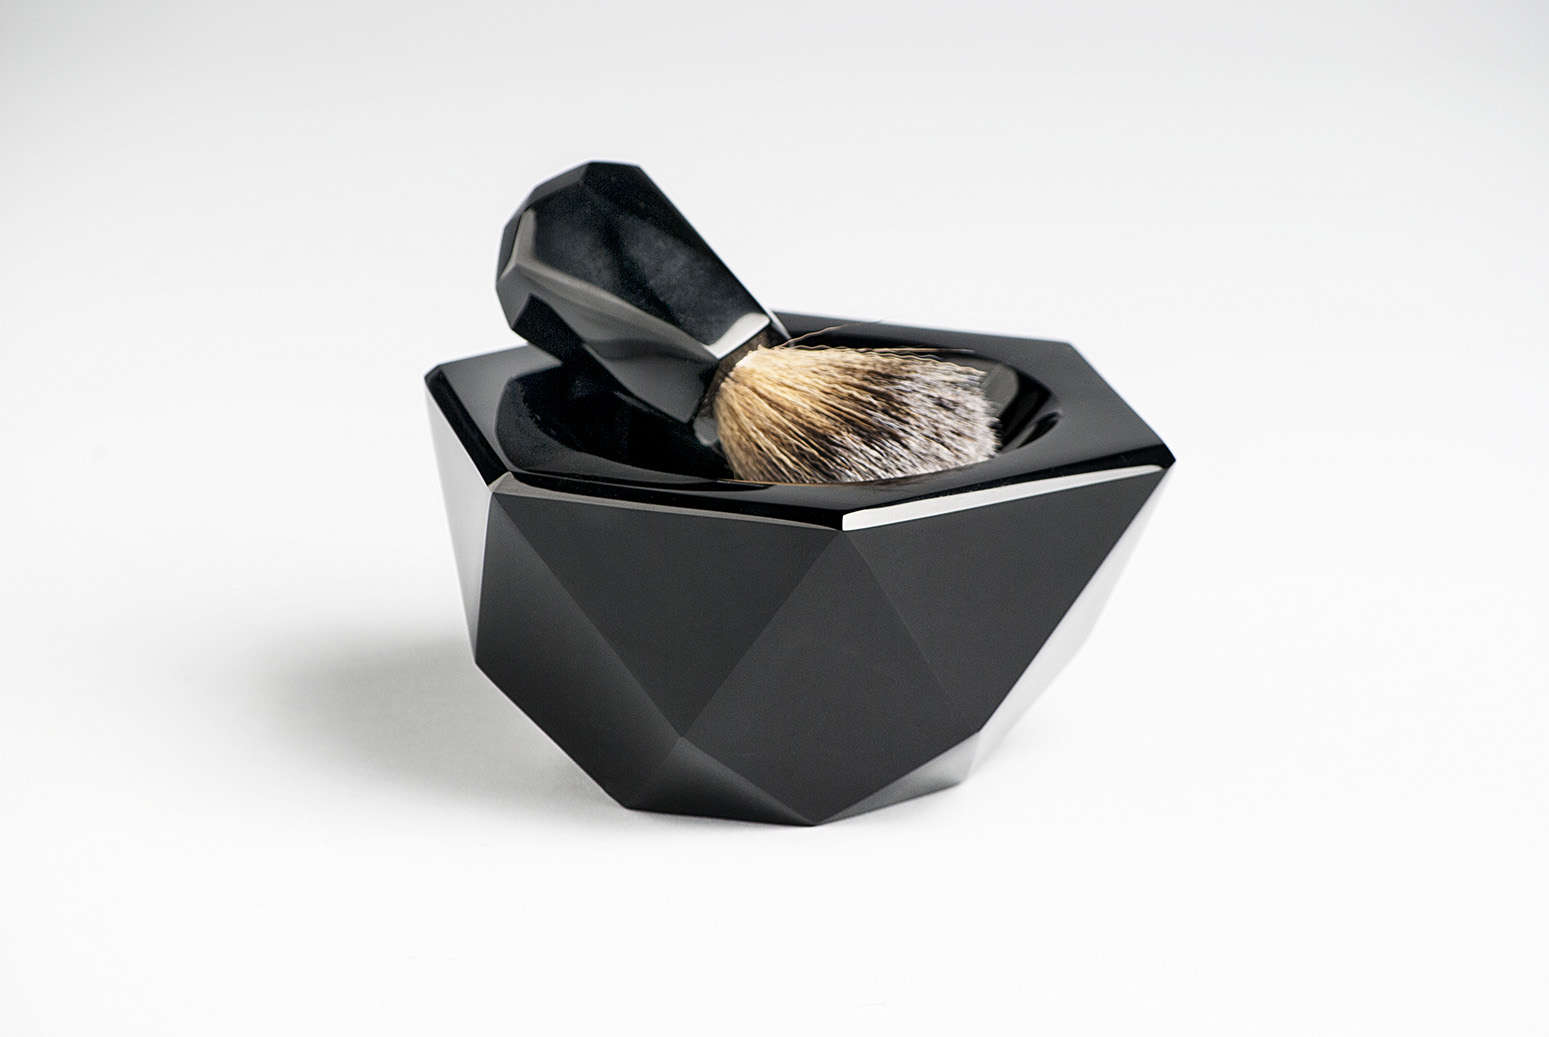 Obsidian-Shaving-accessories-designer-Ittaí González-artisan-Marcos Palma Cruz--Anahuac-MarionFriedmann-MexicoDesignTime9.jpg